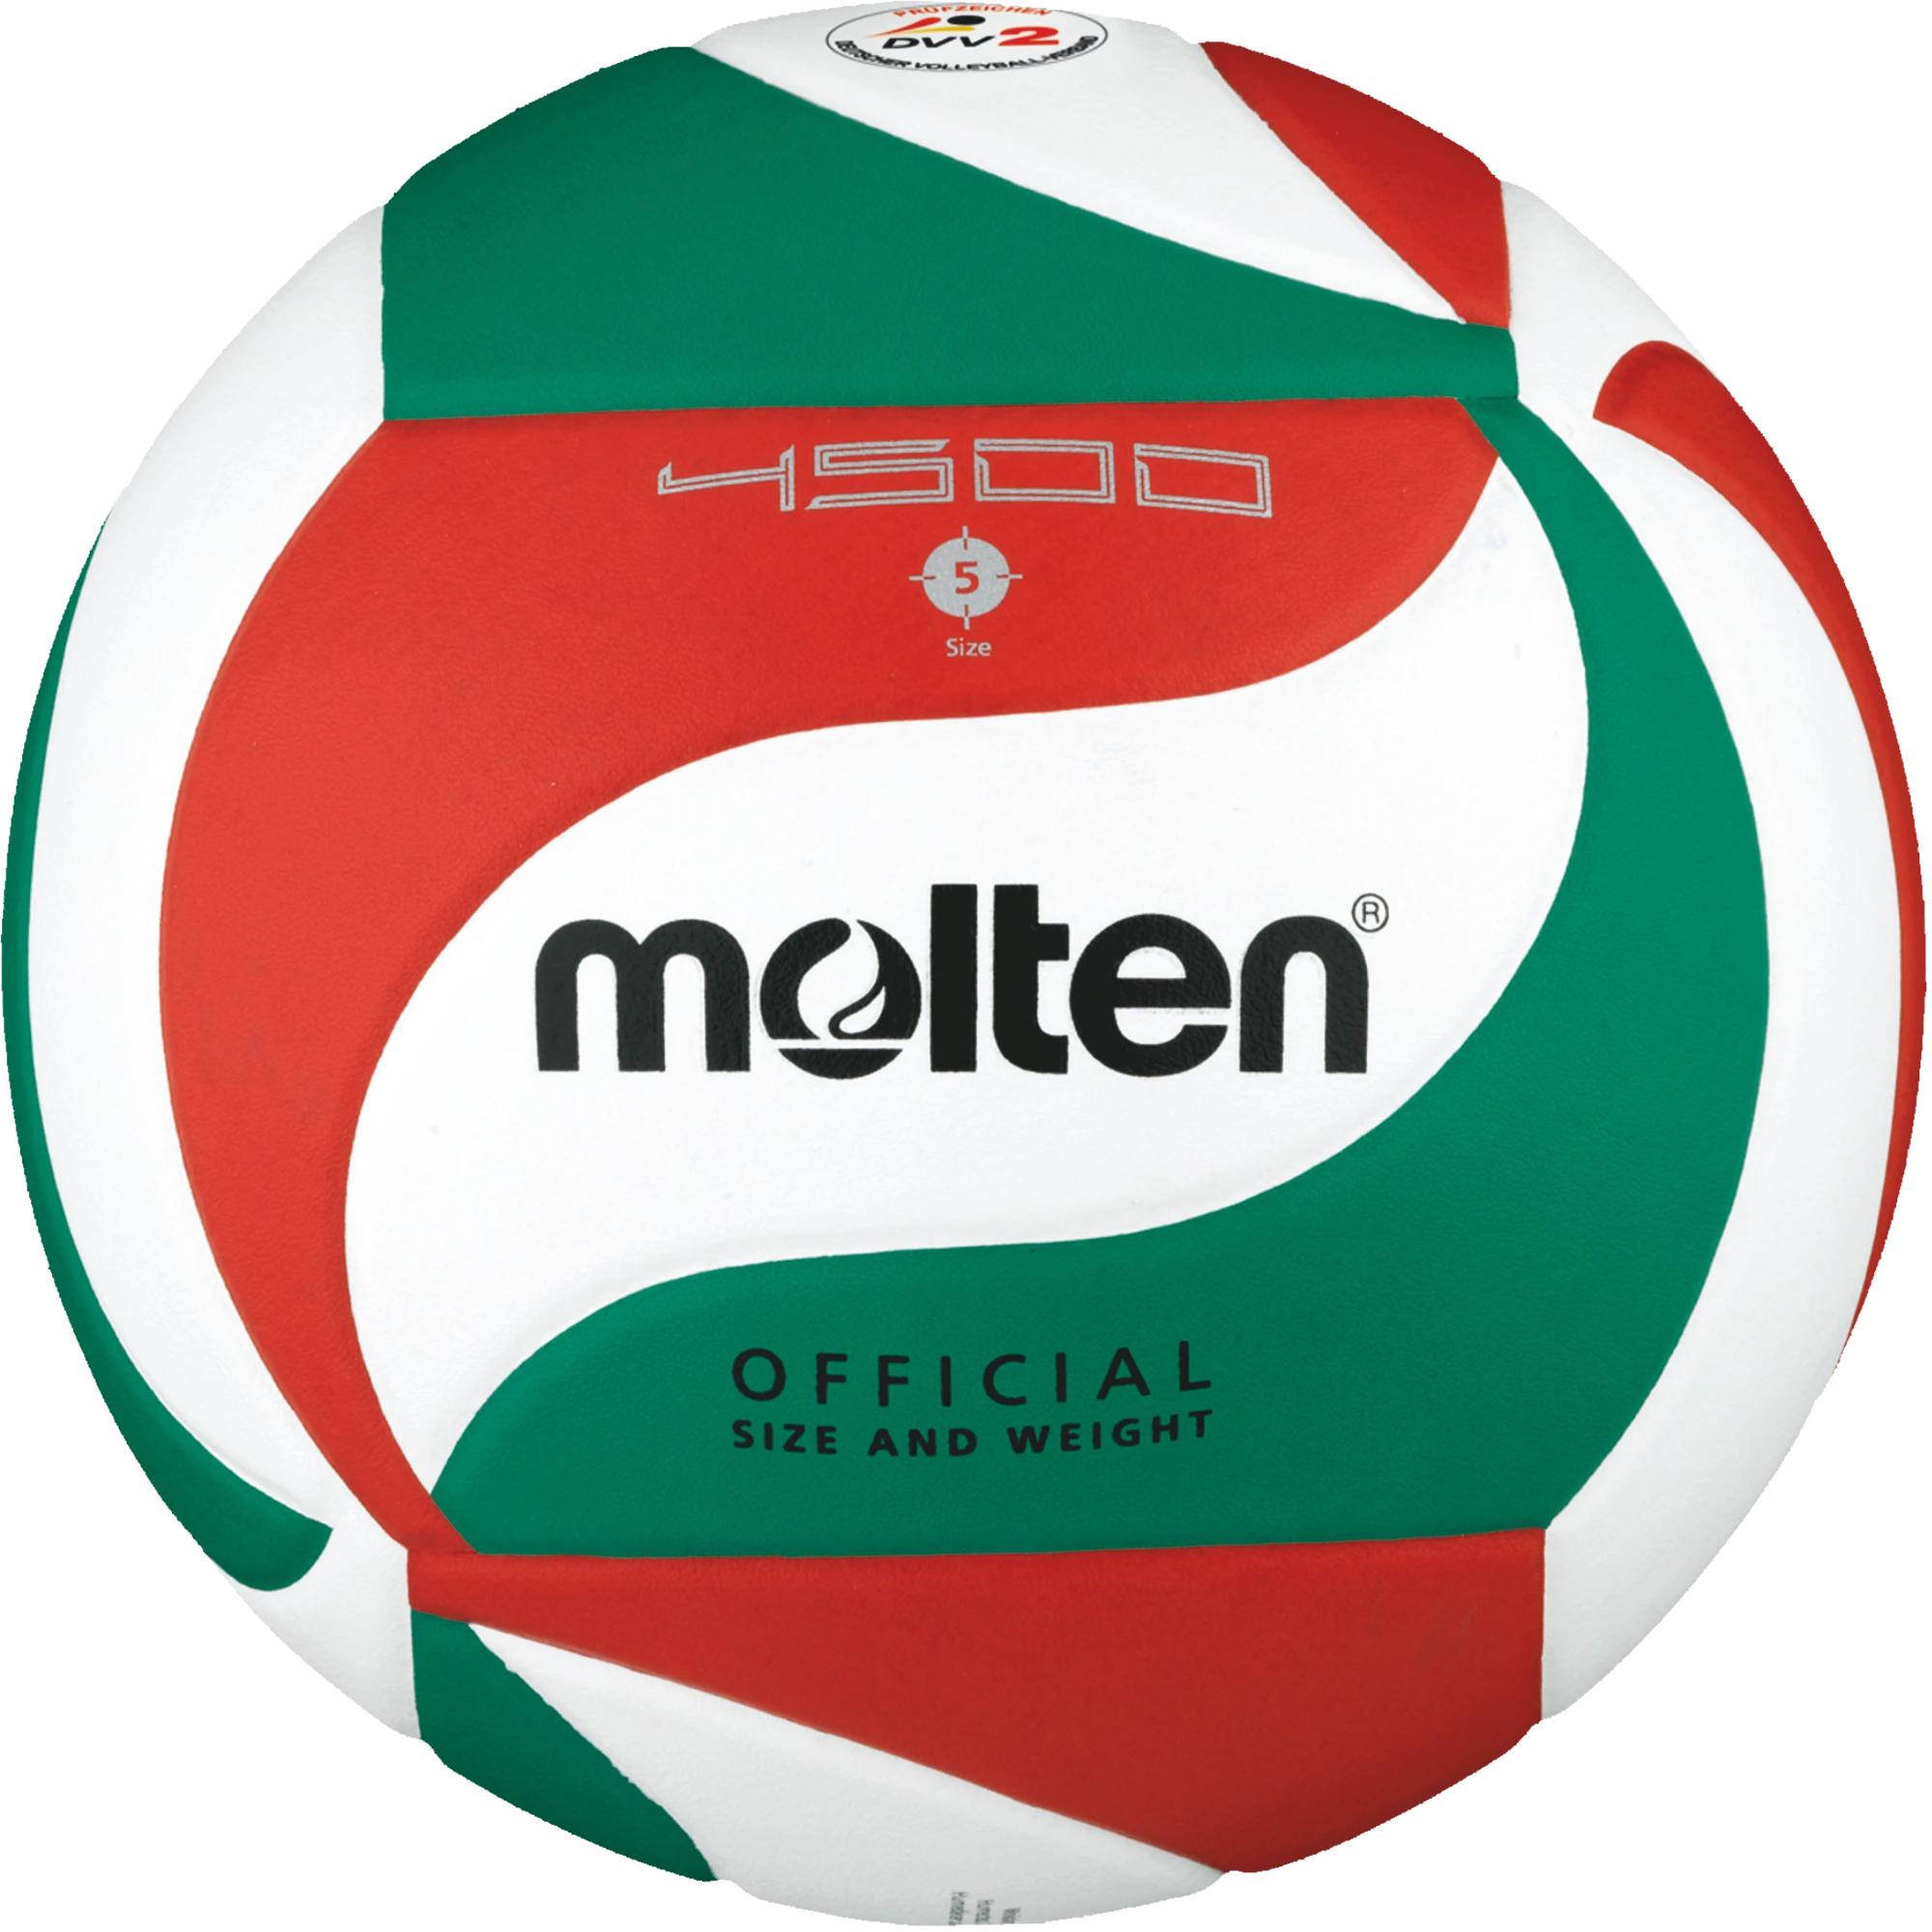 Molten Volleyball - Wettspielball